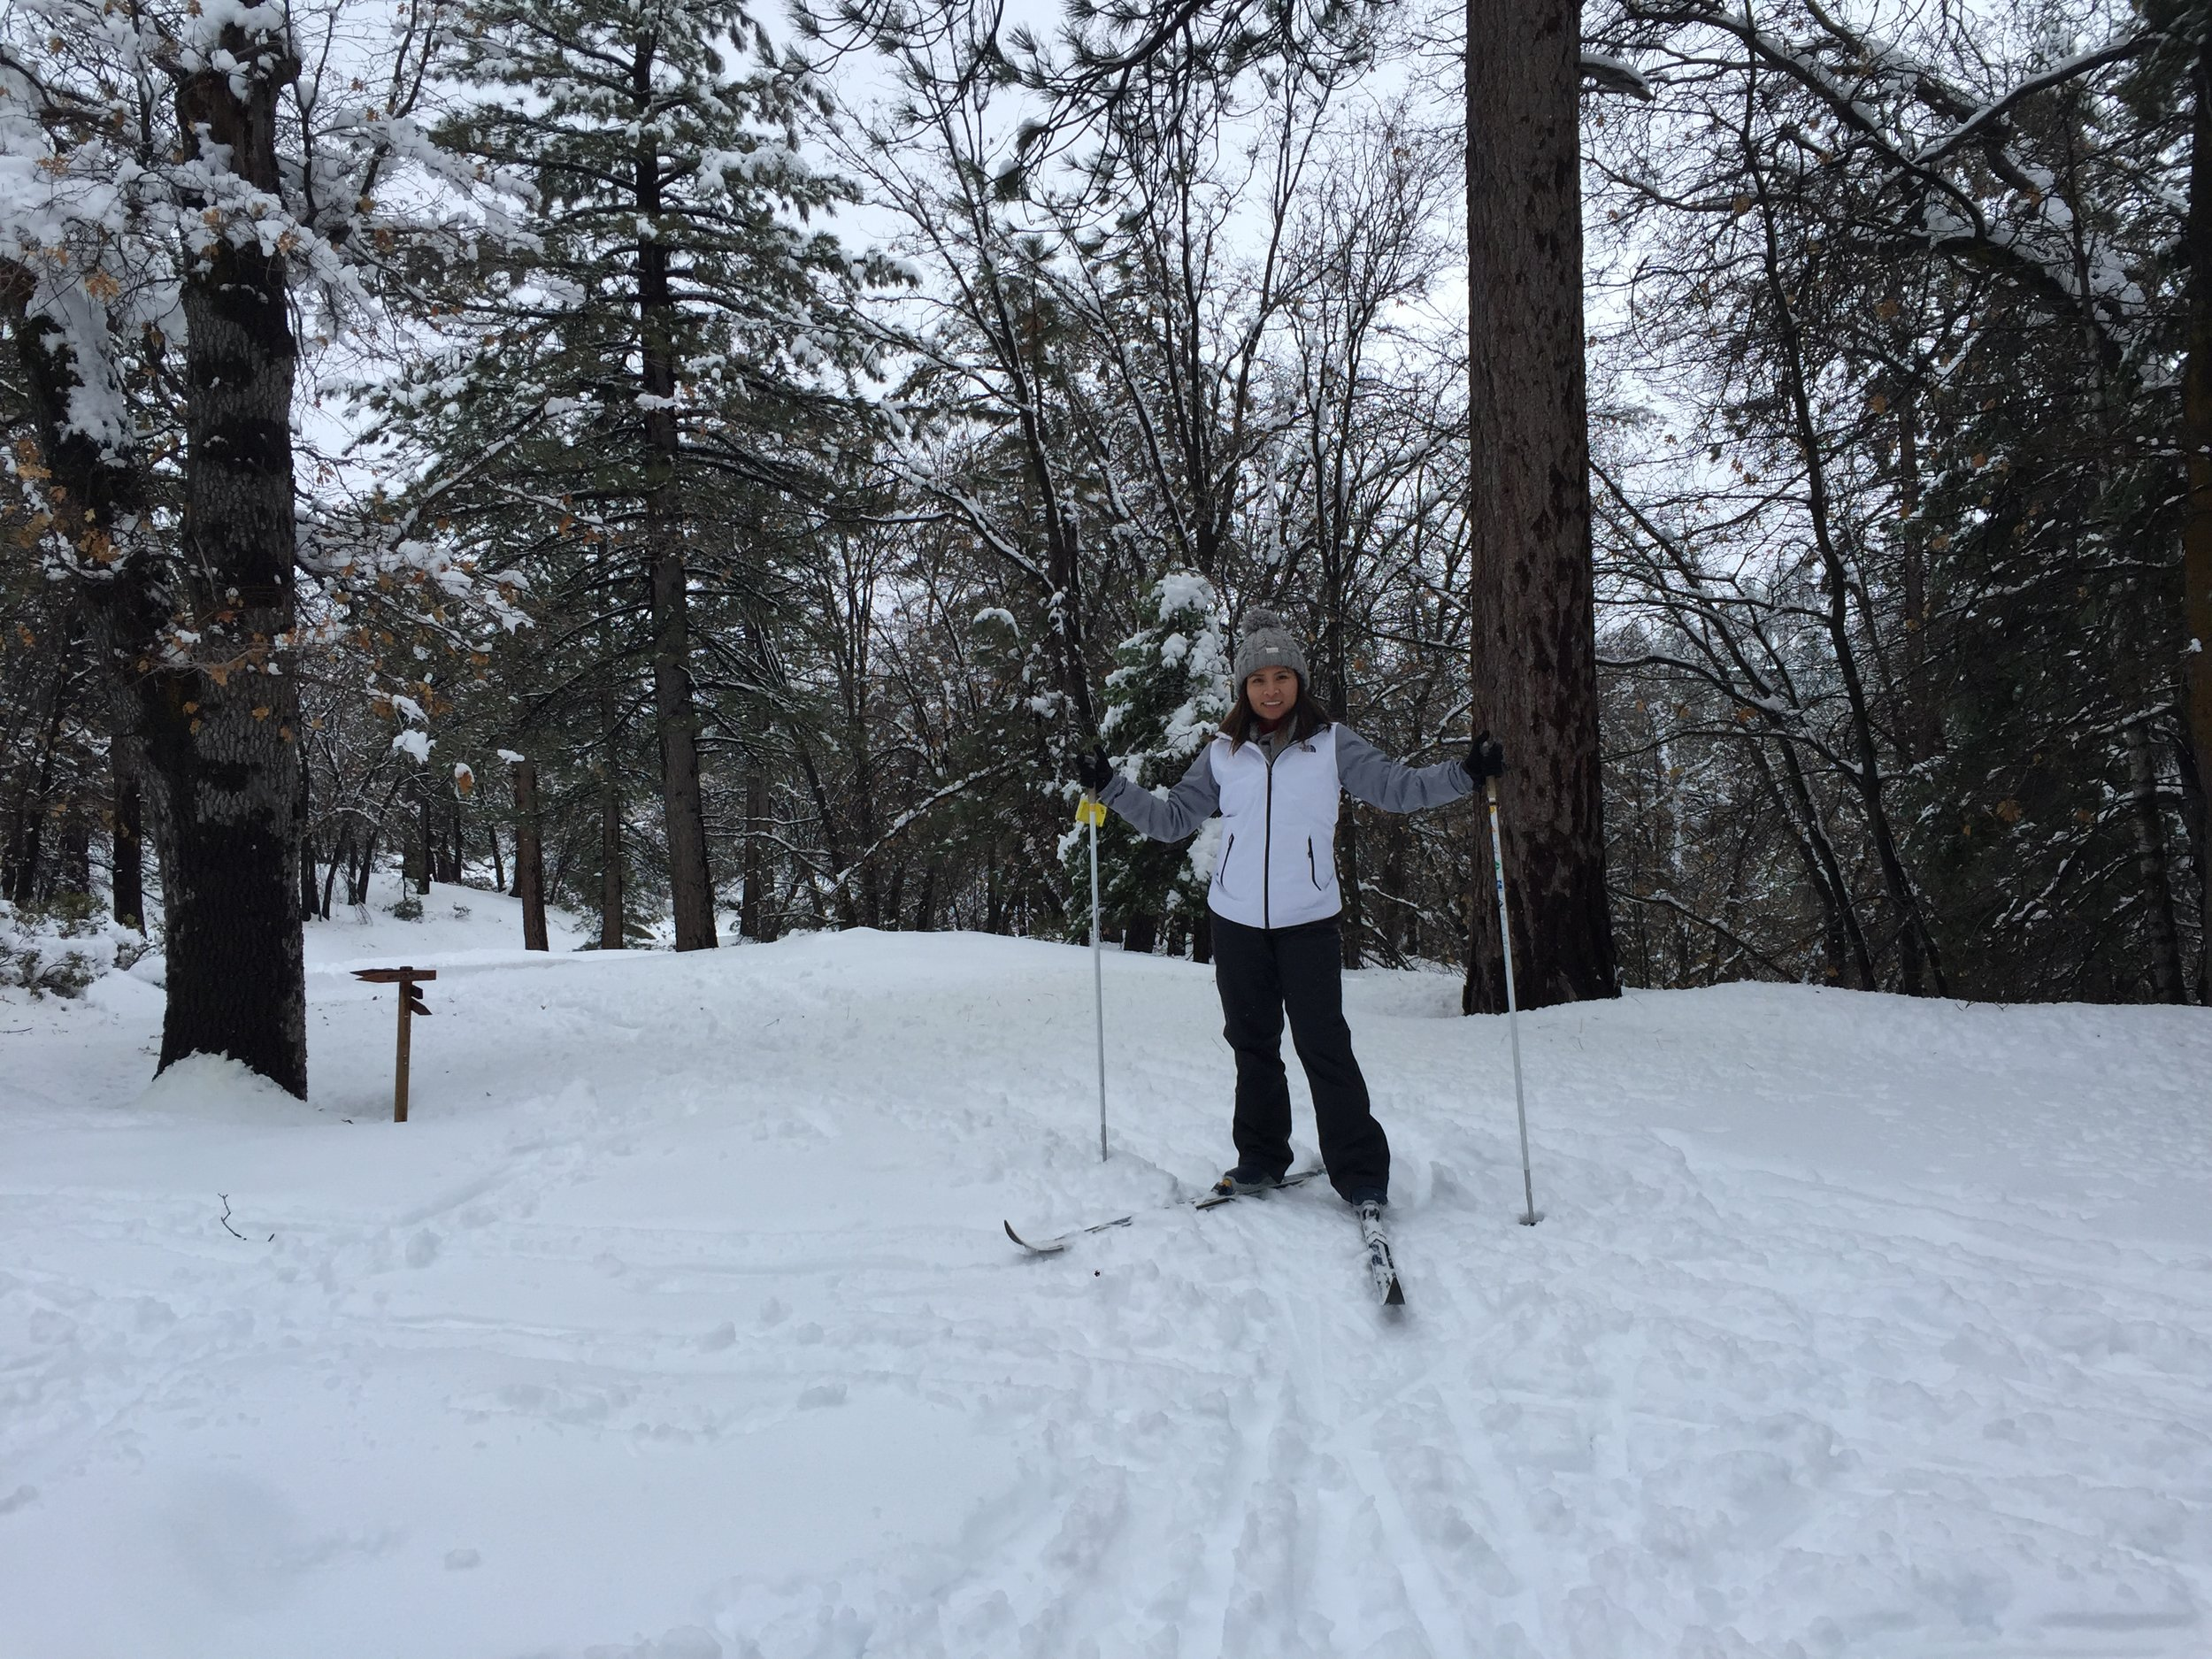 And ski a little bit